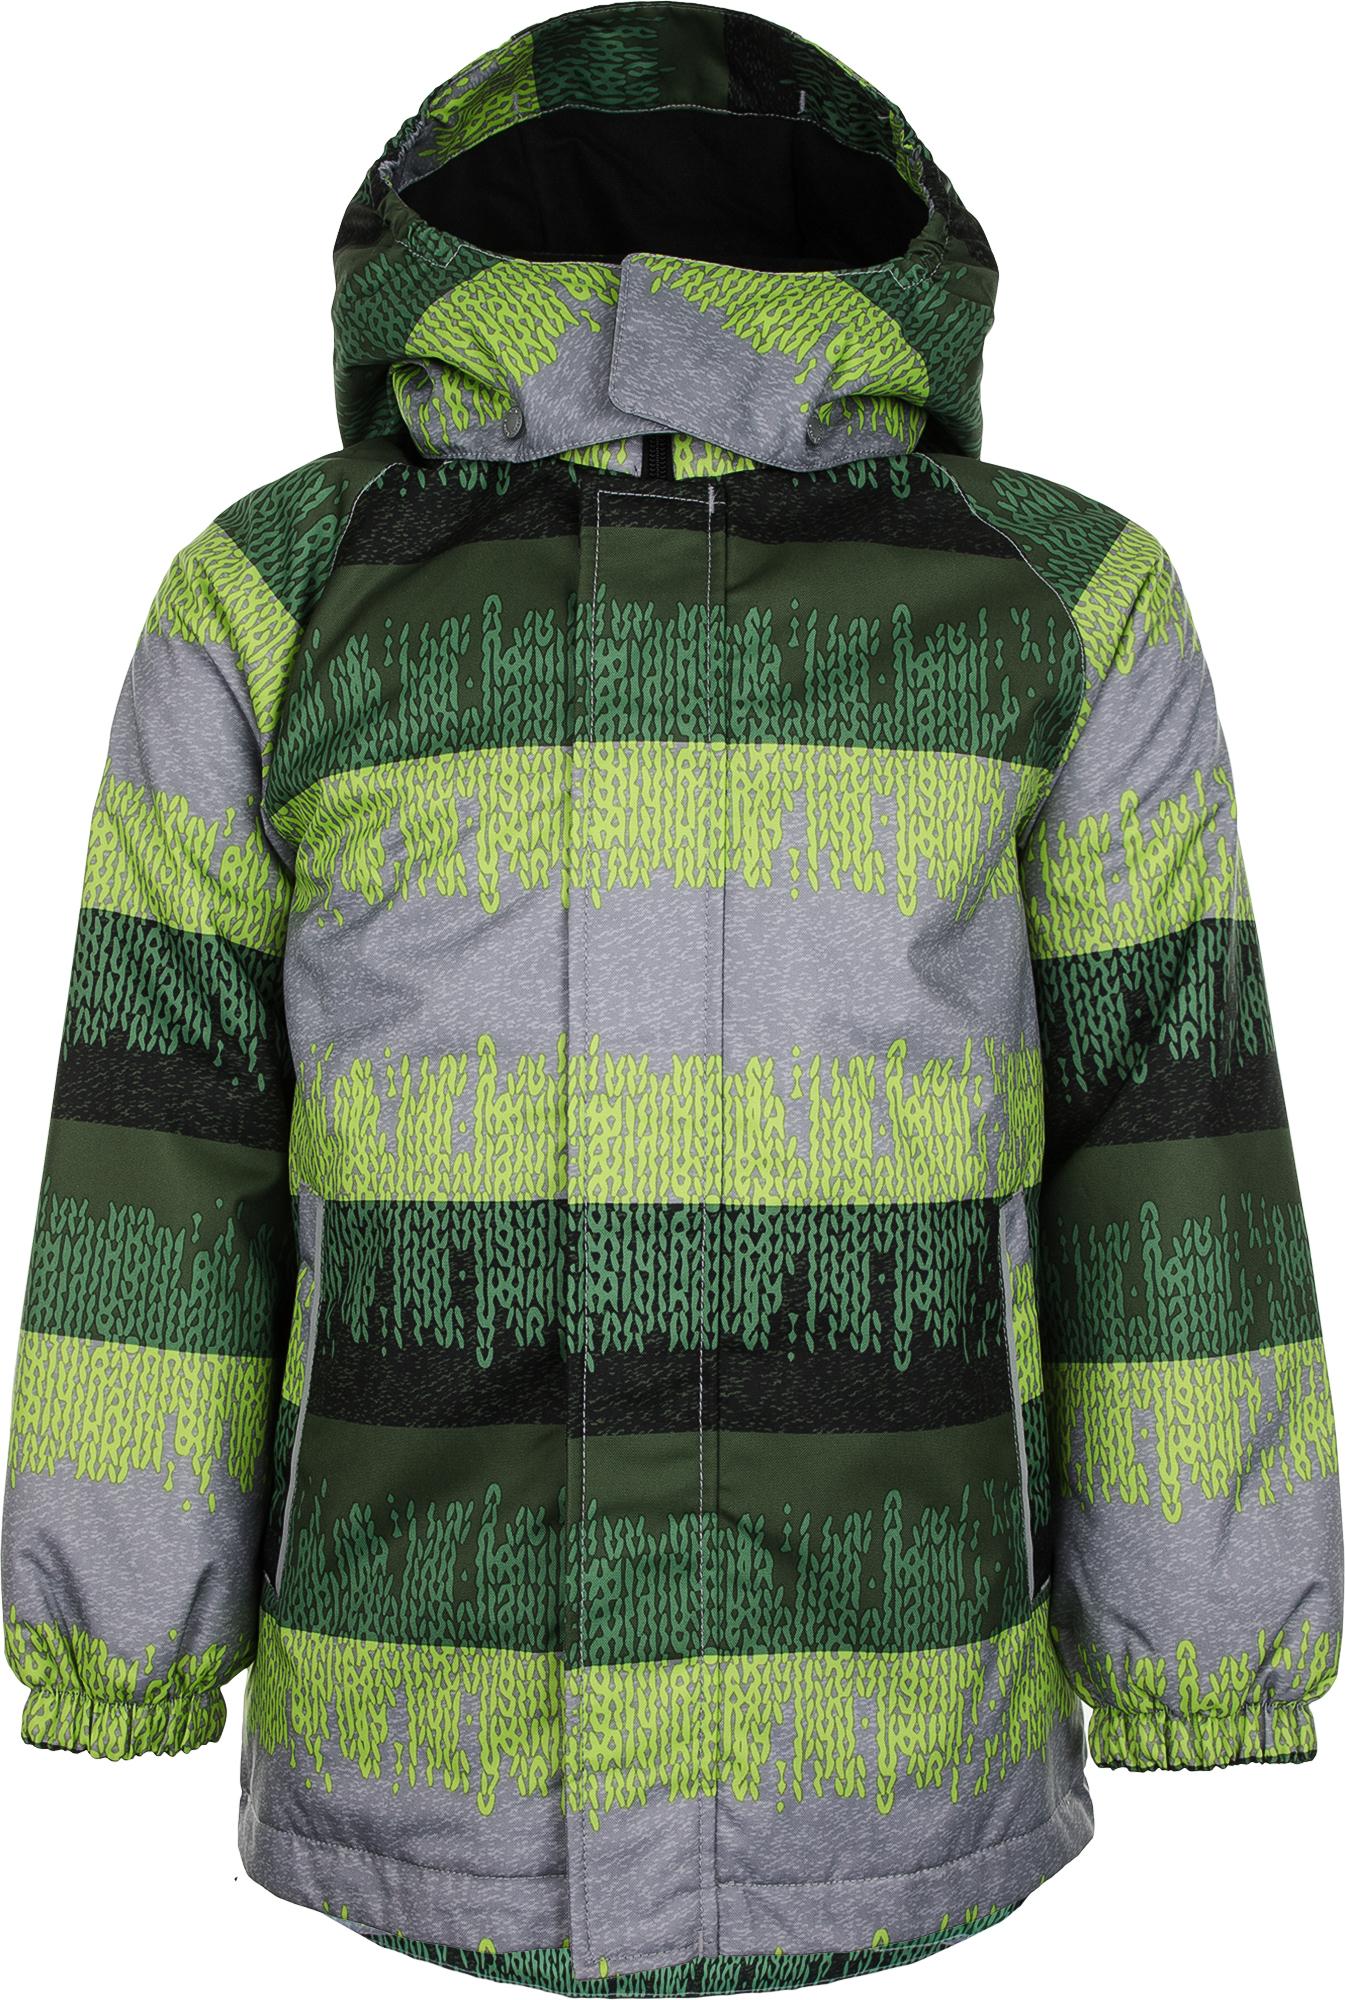 цена на Lassie Куртка утепленная для мальчиков LASSIE Juksu, размер 128